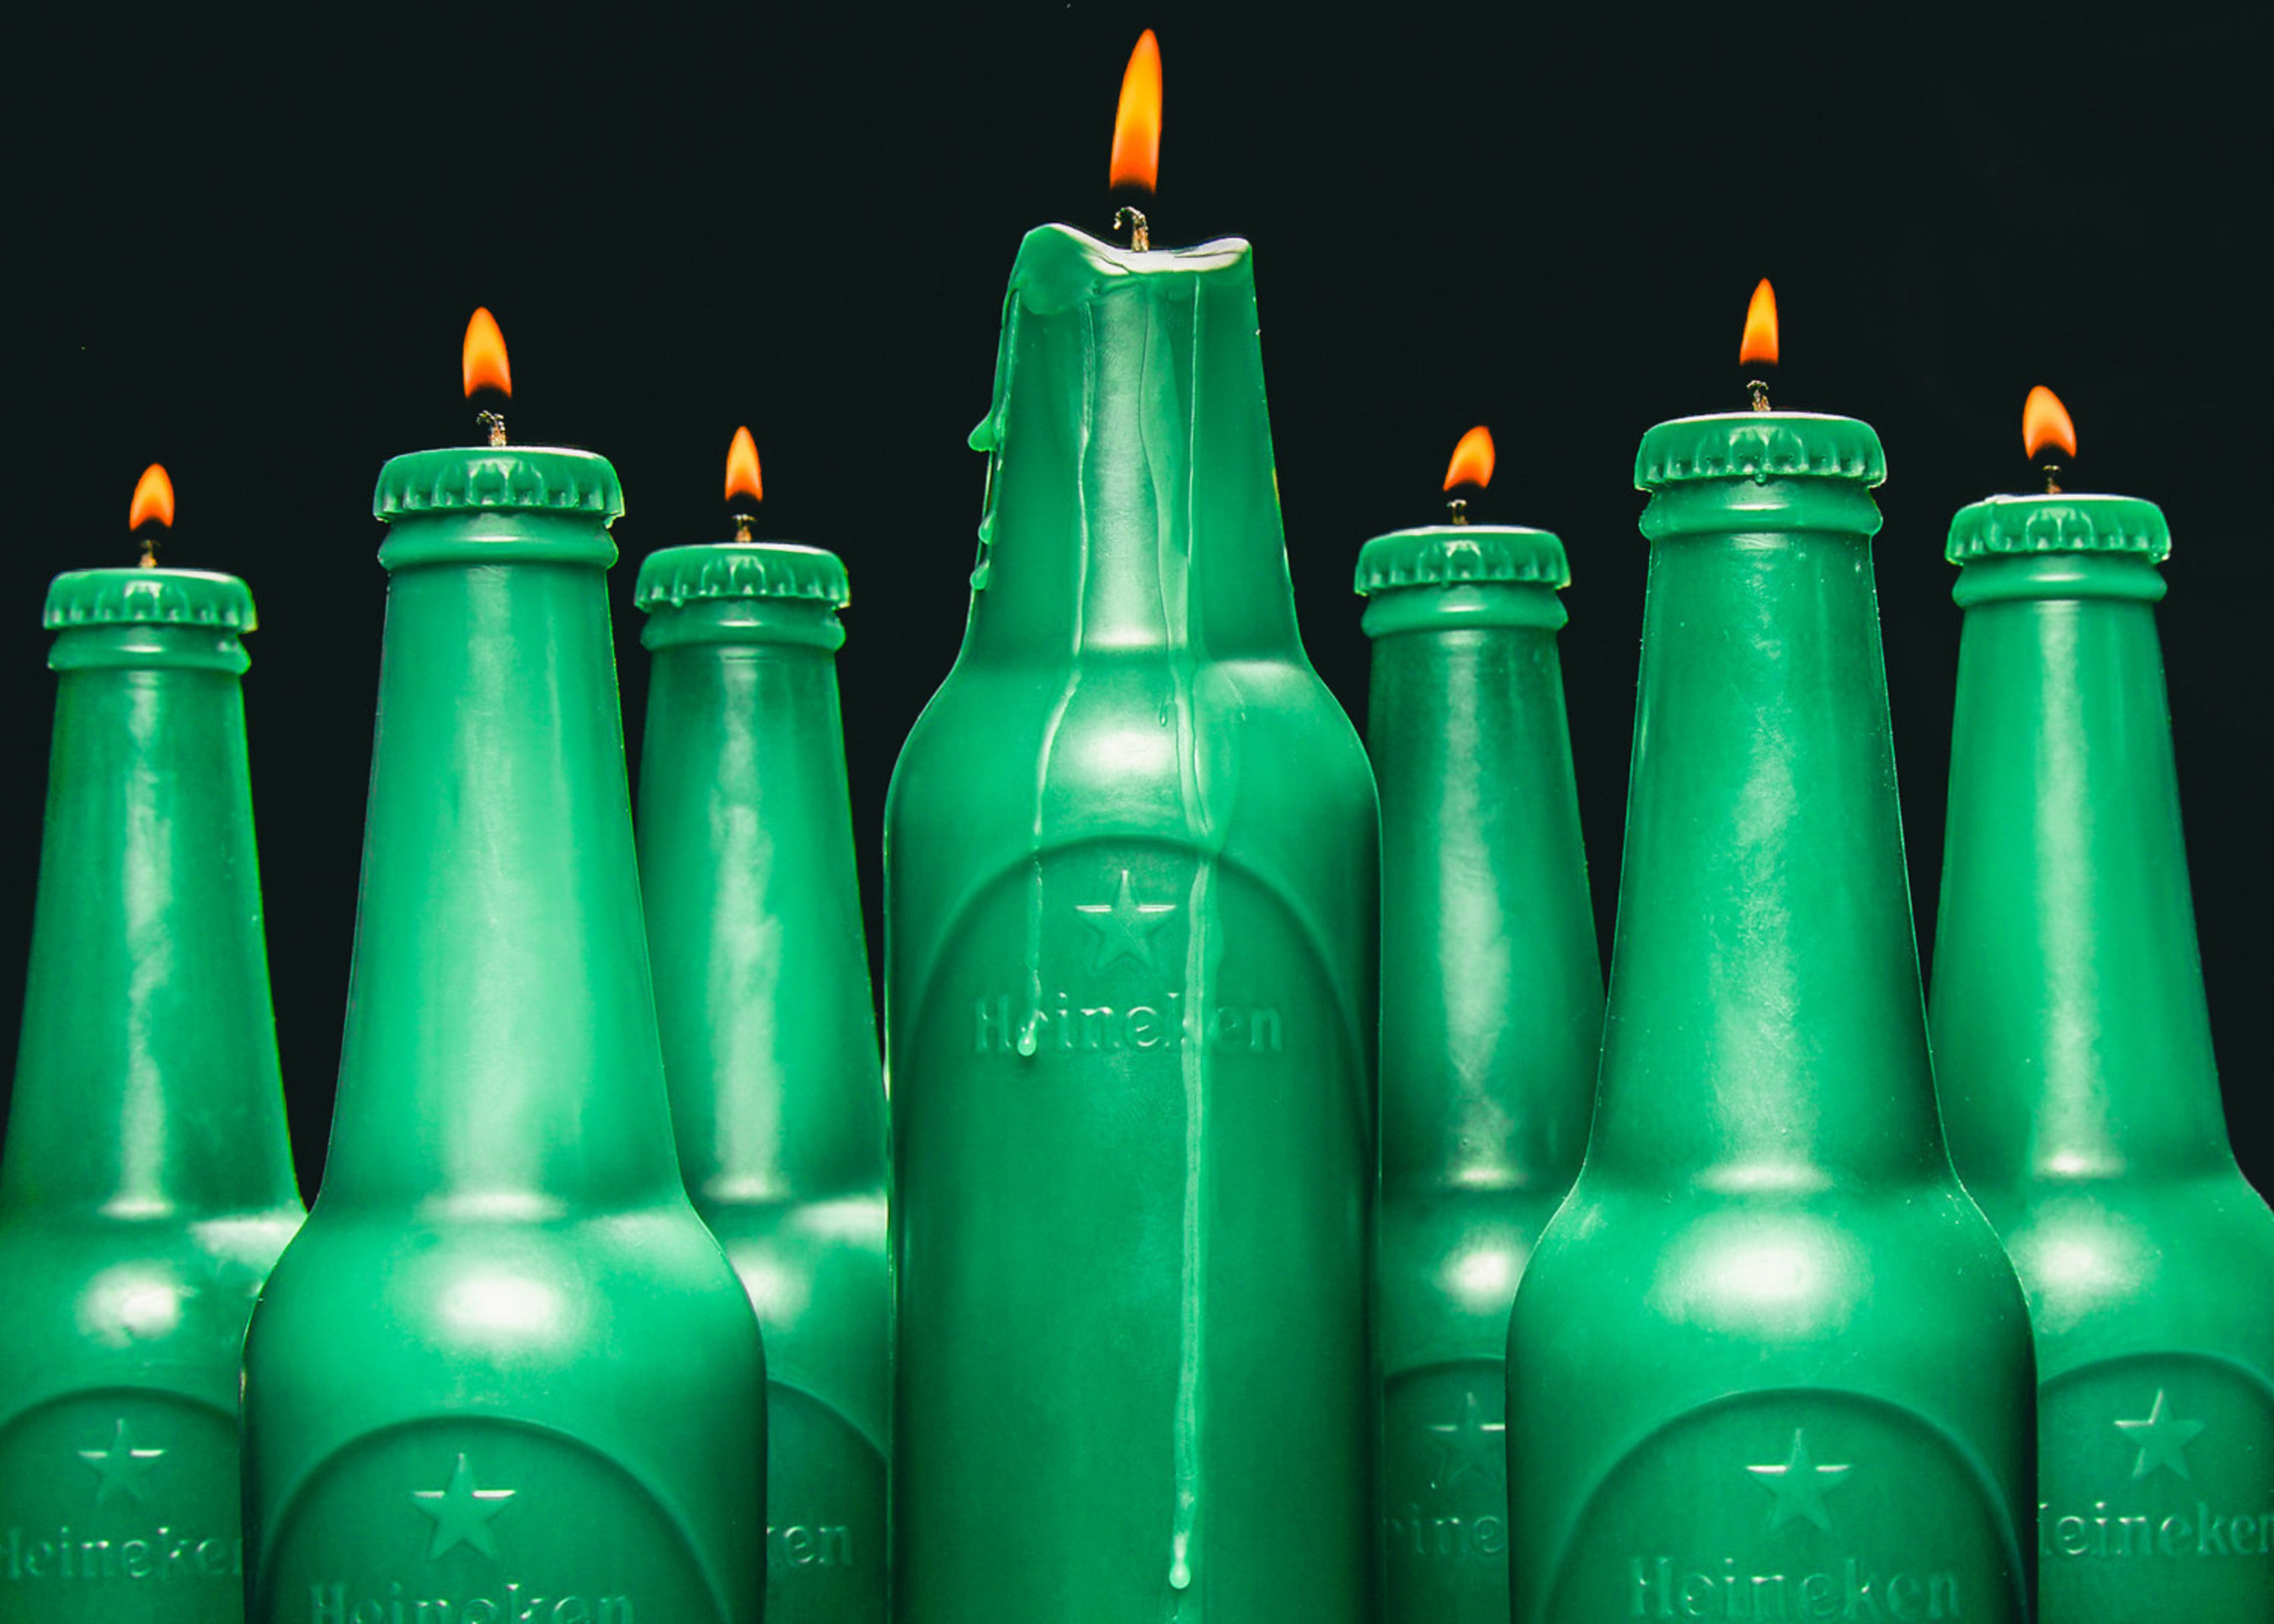 HEINEKEN and Miami's Alchemist introduce six-pack of handmade candles for #Heineken100 program.